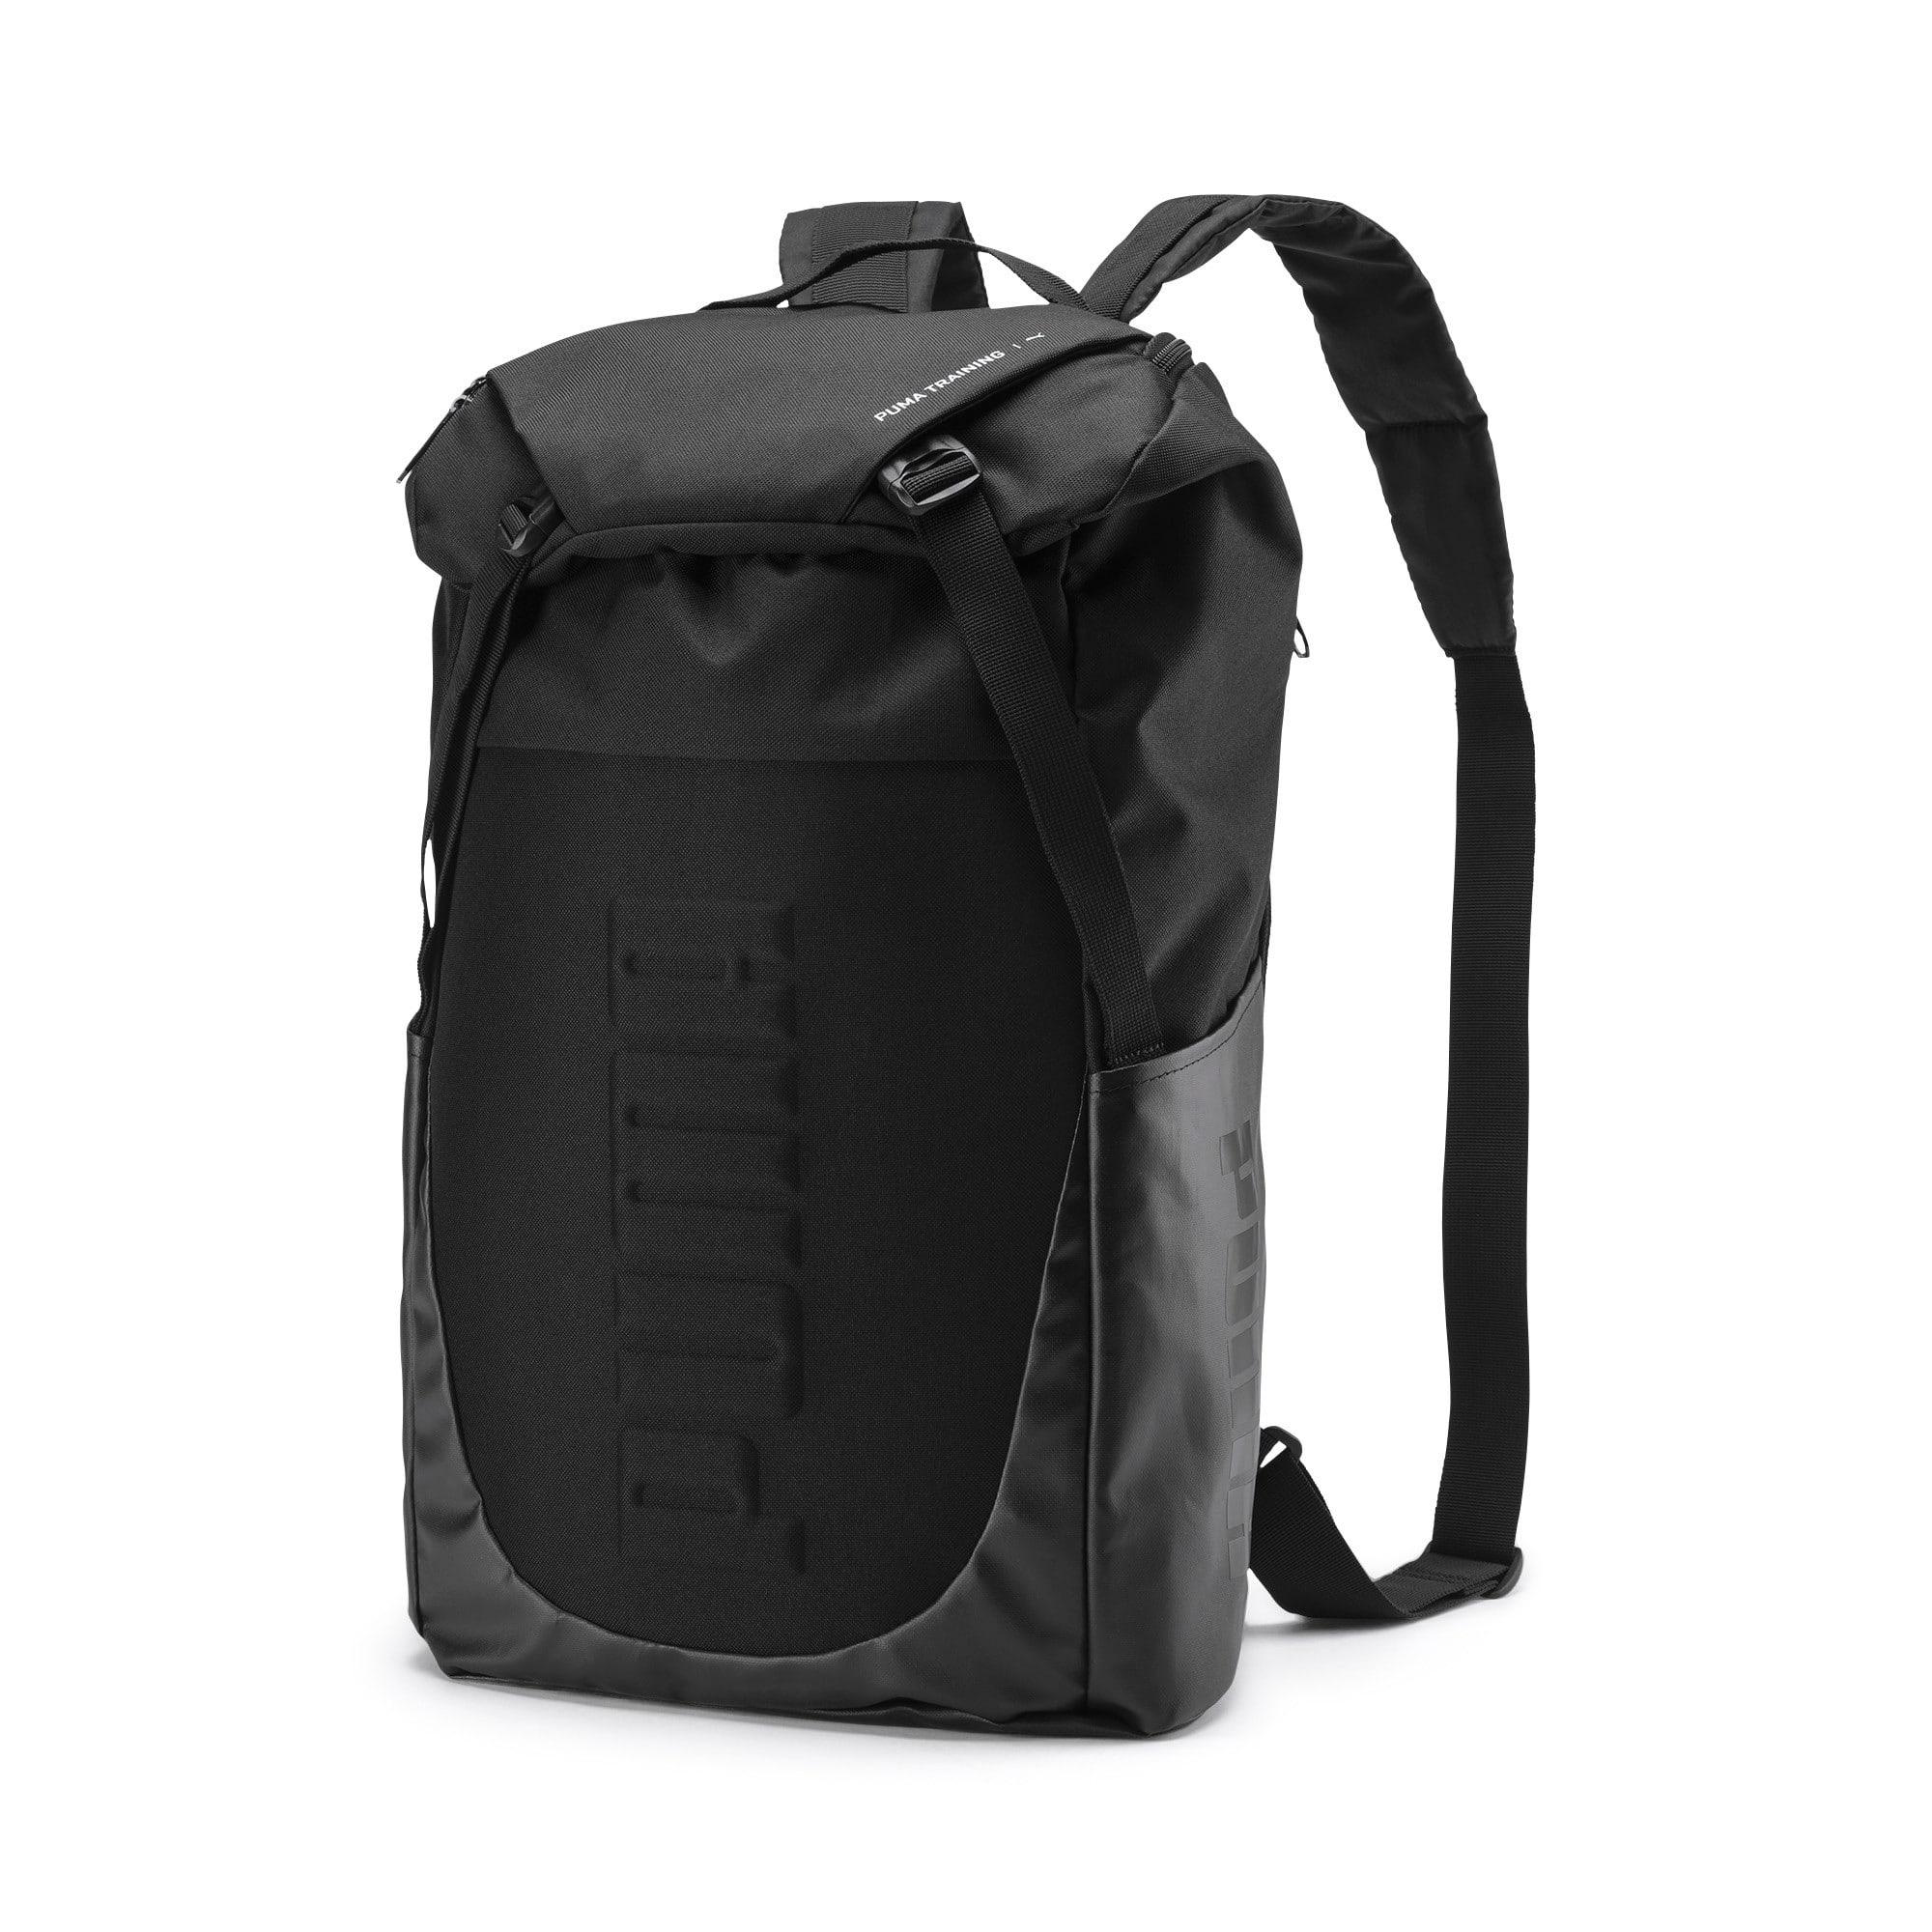 Thumbnail 1 of Training Transform Duffle Bag, Puma Black, medium-IND